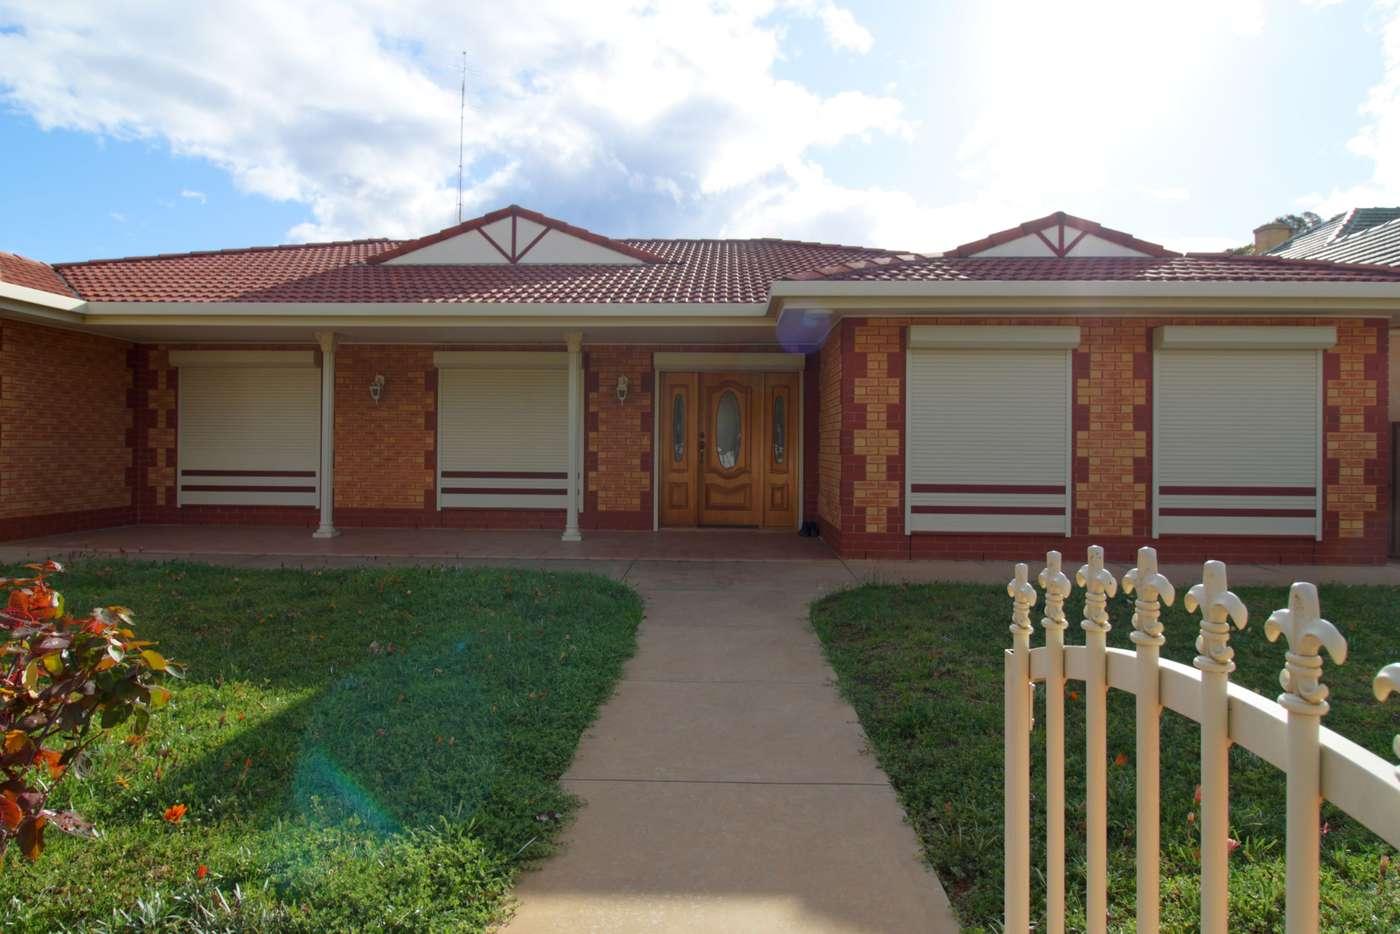 Main view of Homely house listing, 12 Fowles Street, Barmera SA 5345